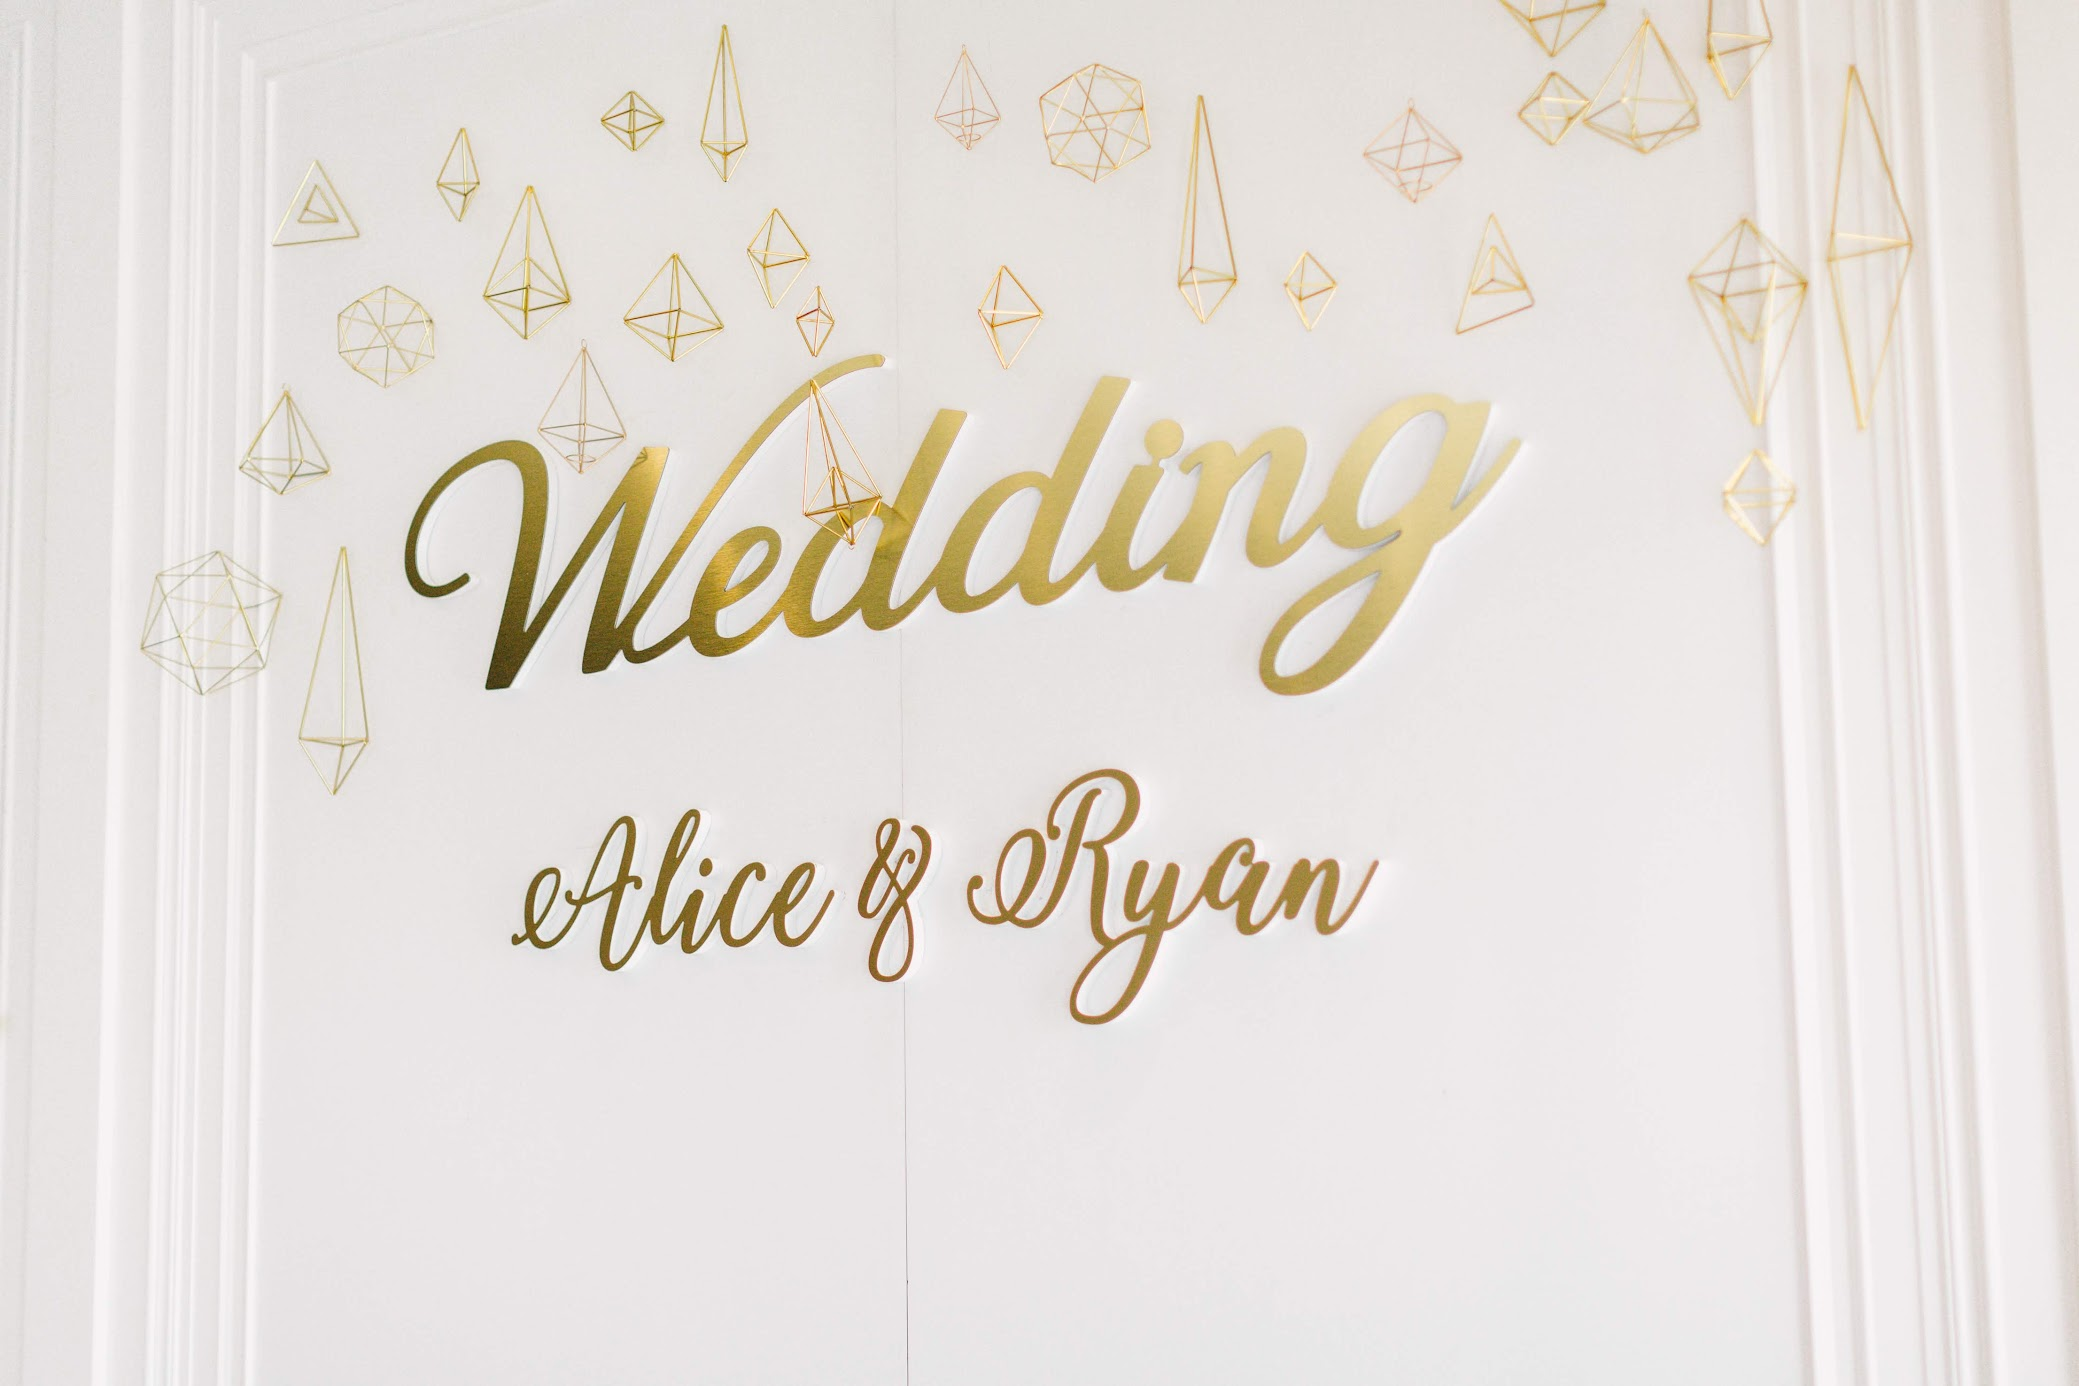 undefined在 台中 的 萊特薇庭 釜宮 場地舉行陽光正好的美式 婚禮 , 是每位新娘夢寐以求的西式婚禮樣式!